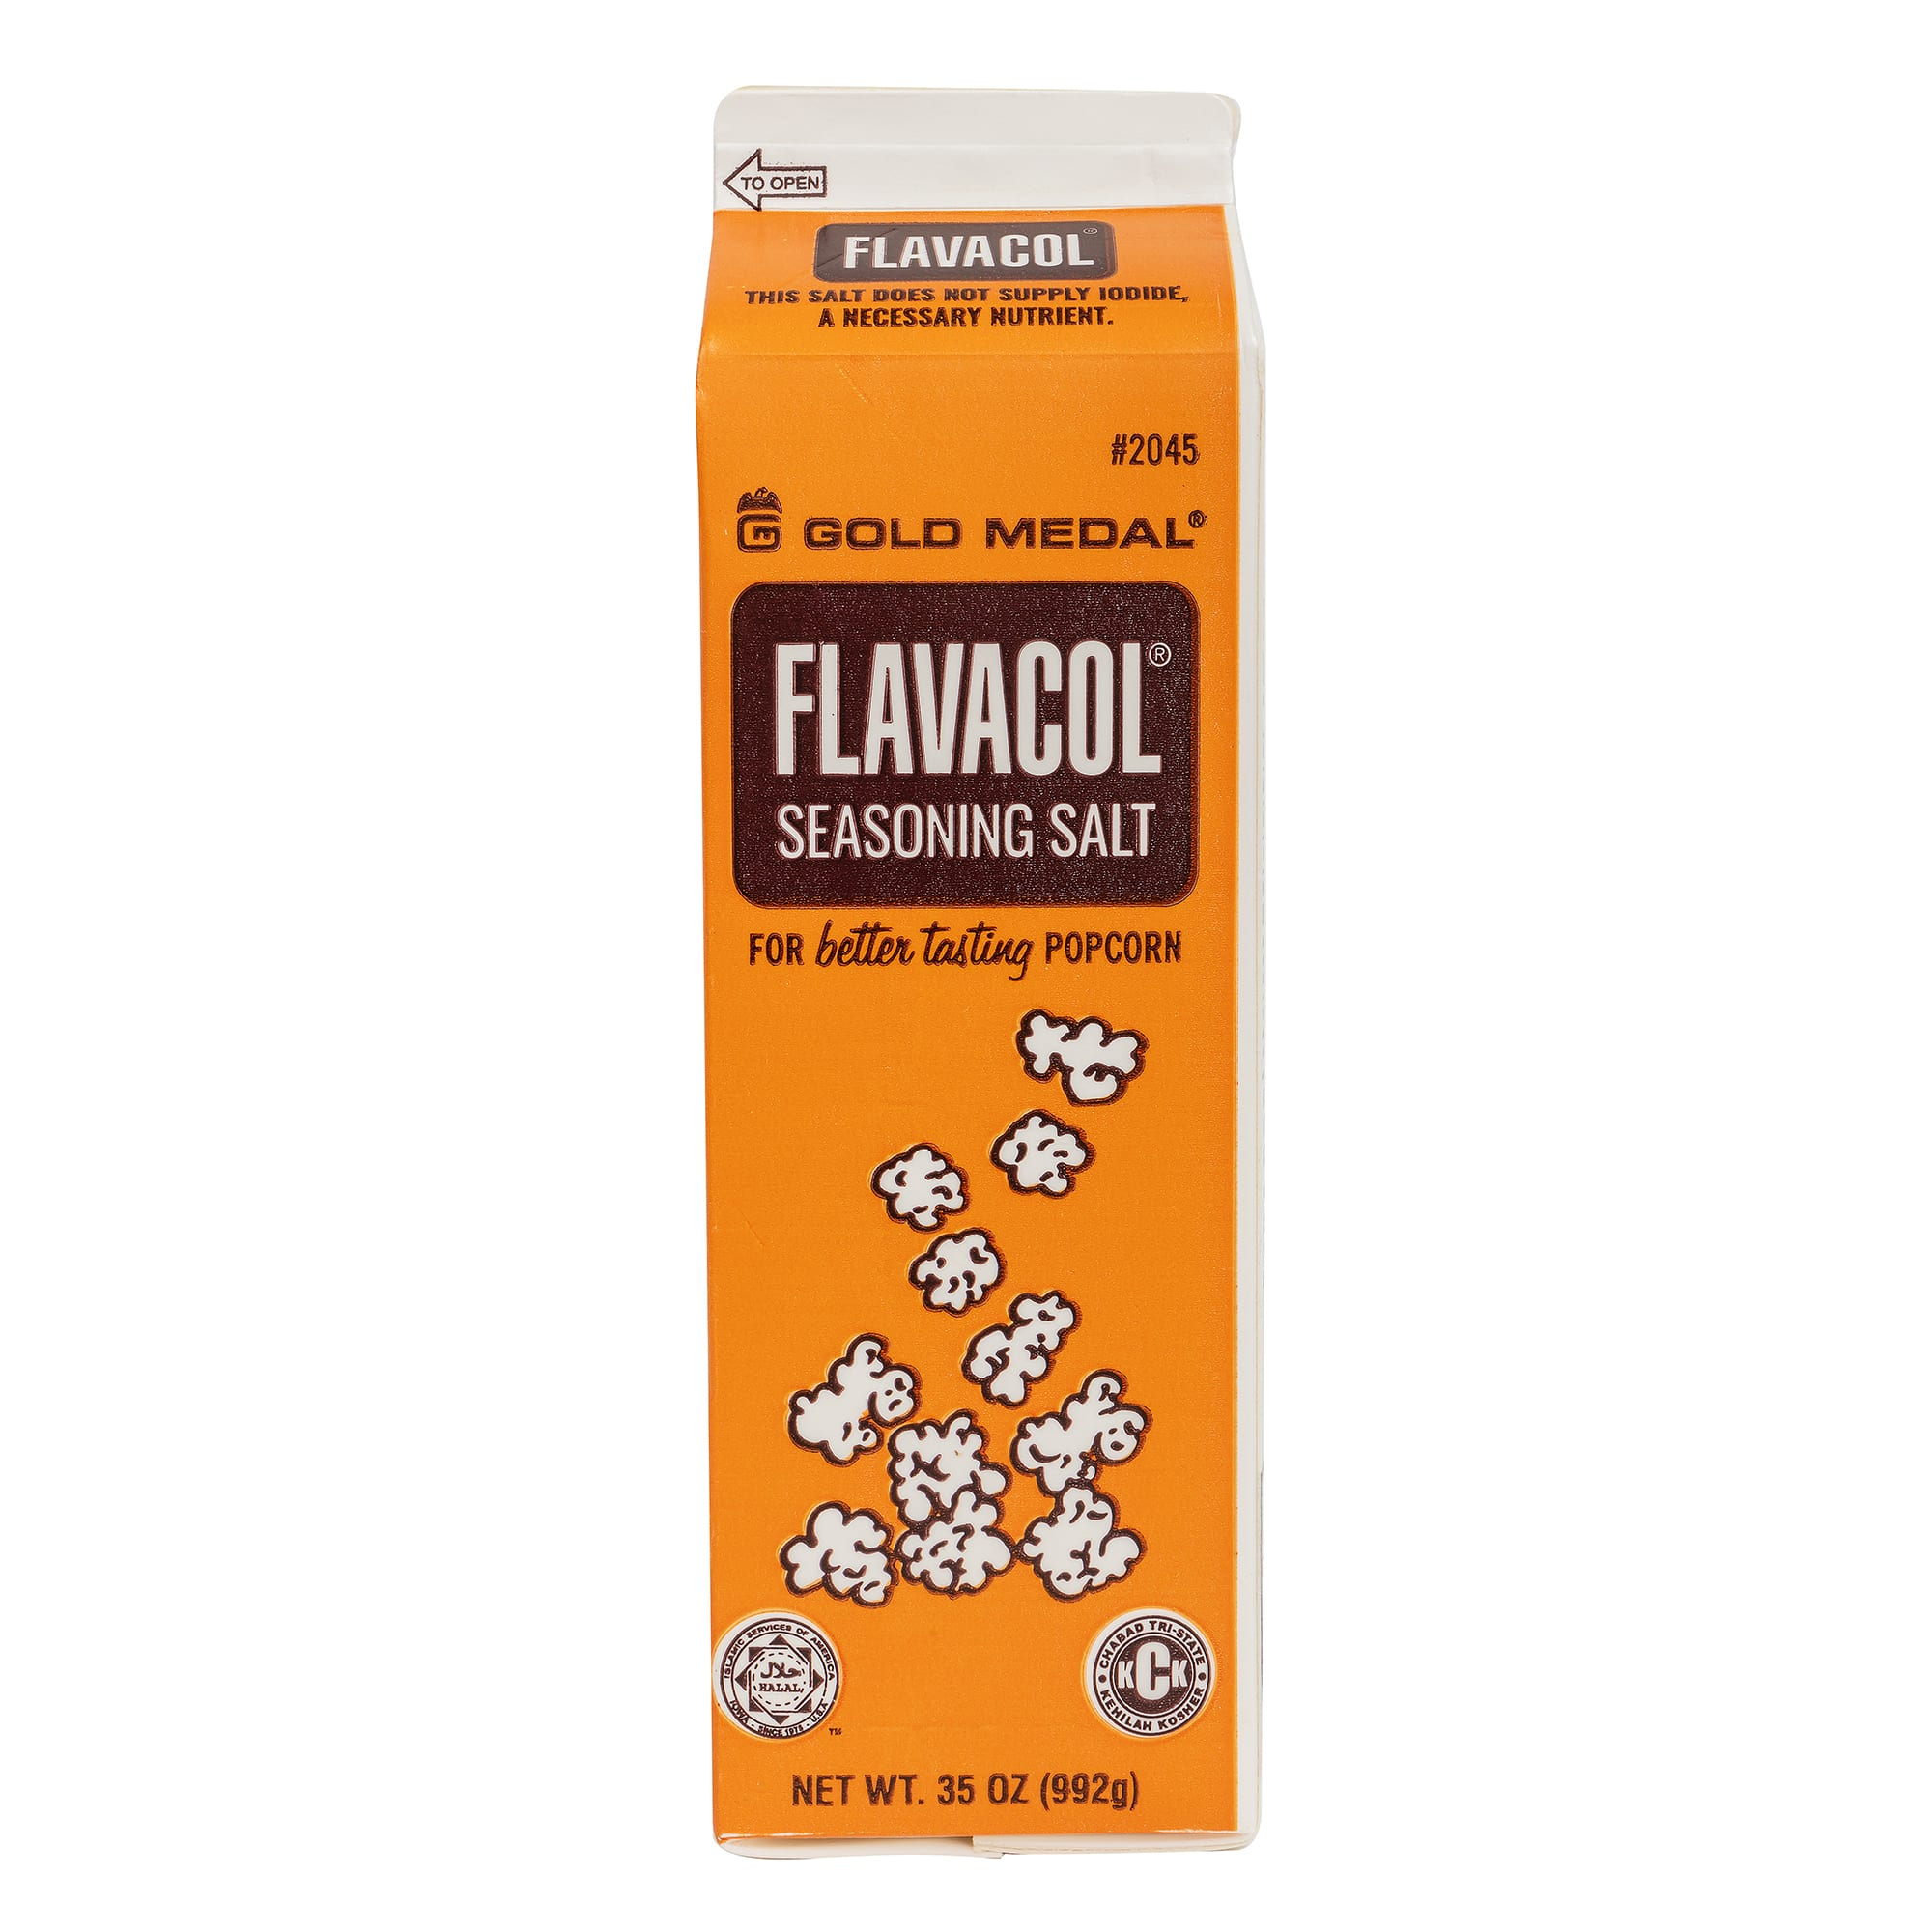 Gold Medal 2045 Original Flavacol Seasoning Salt w/ (12) 35-oz Cartons, Gluten Free